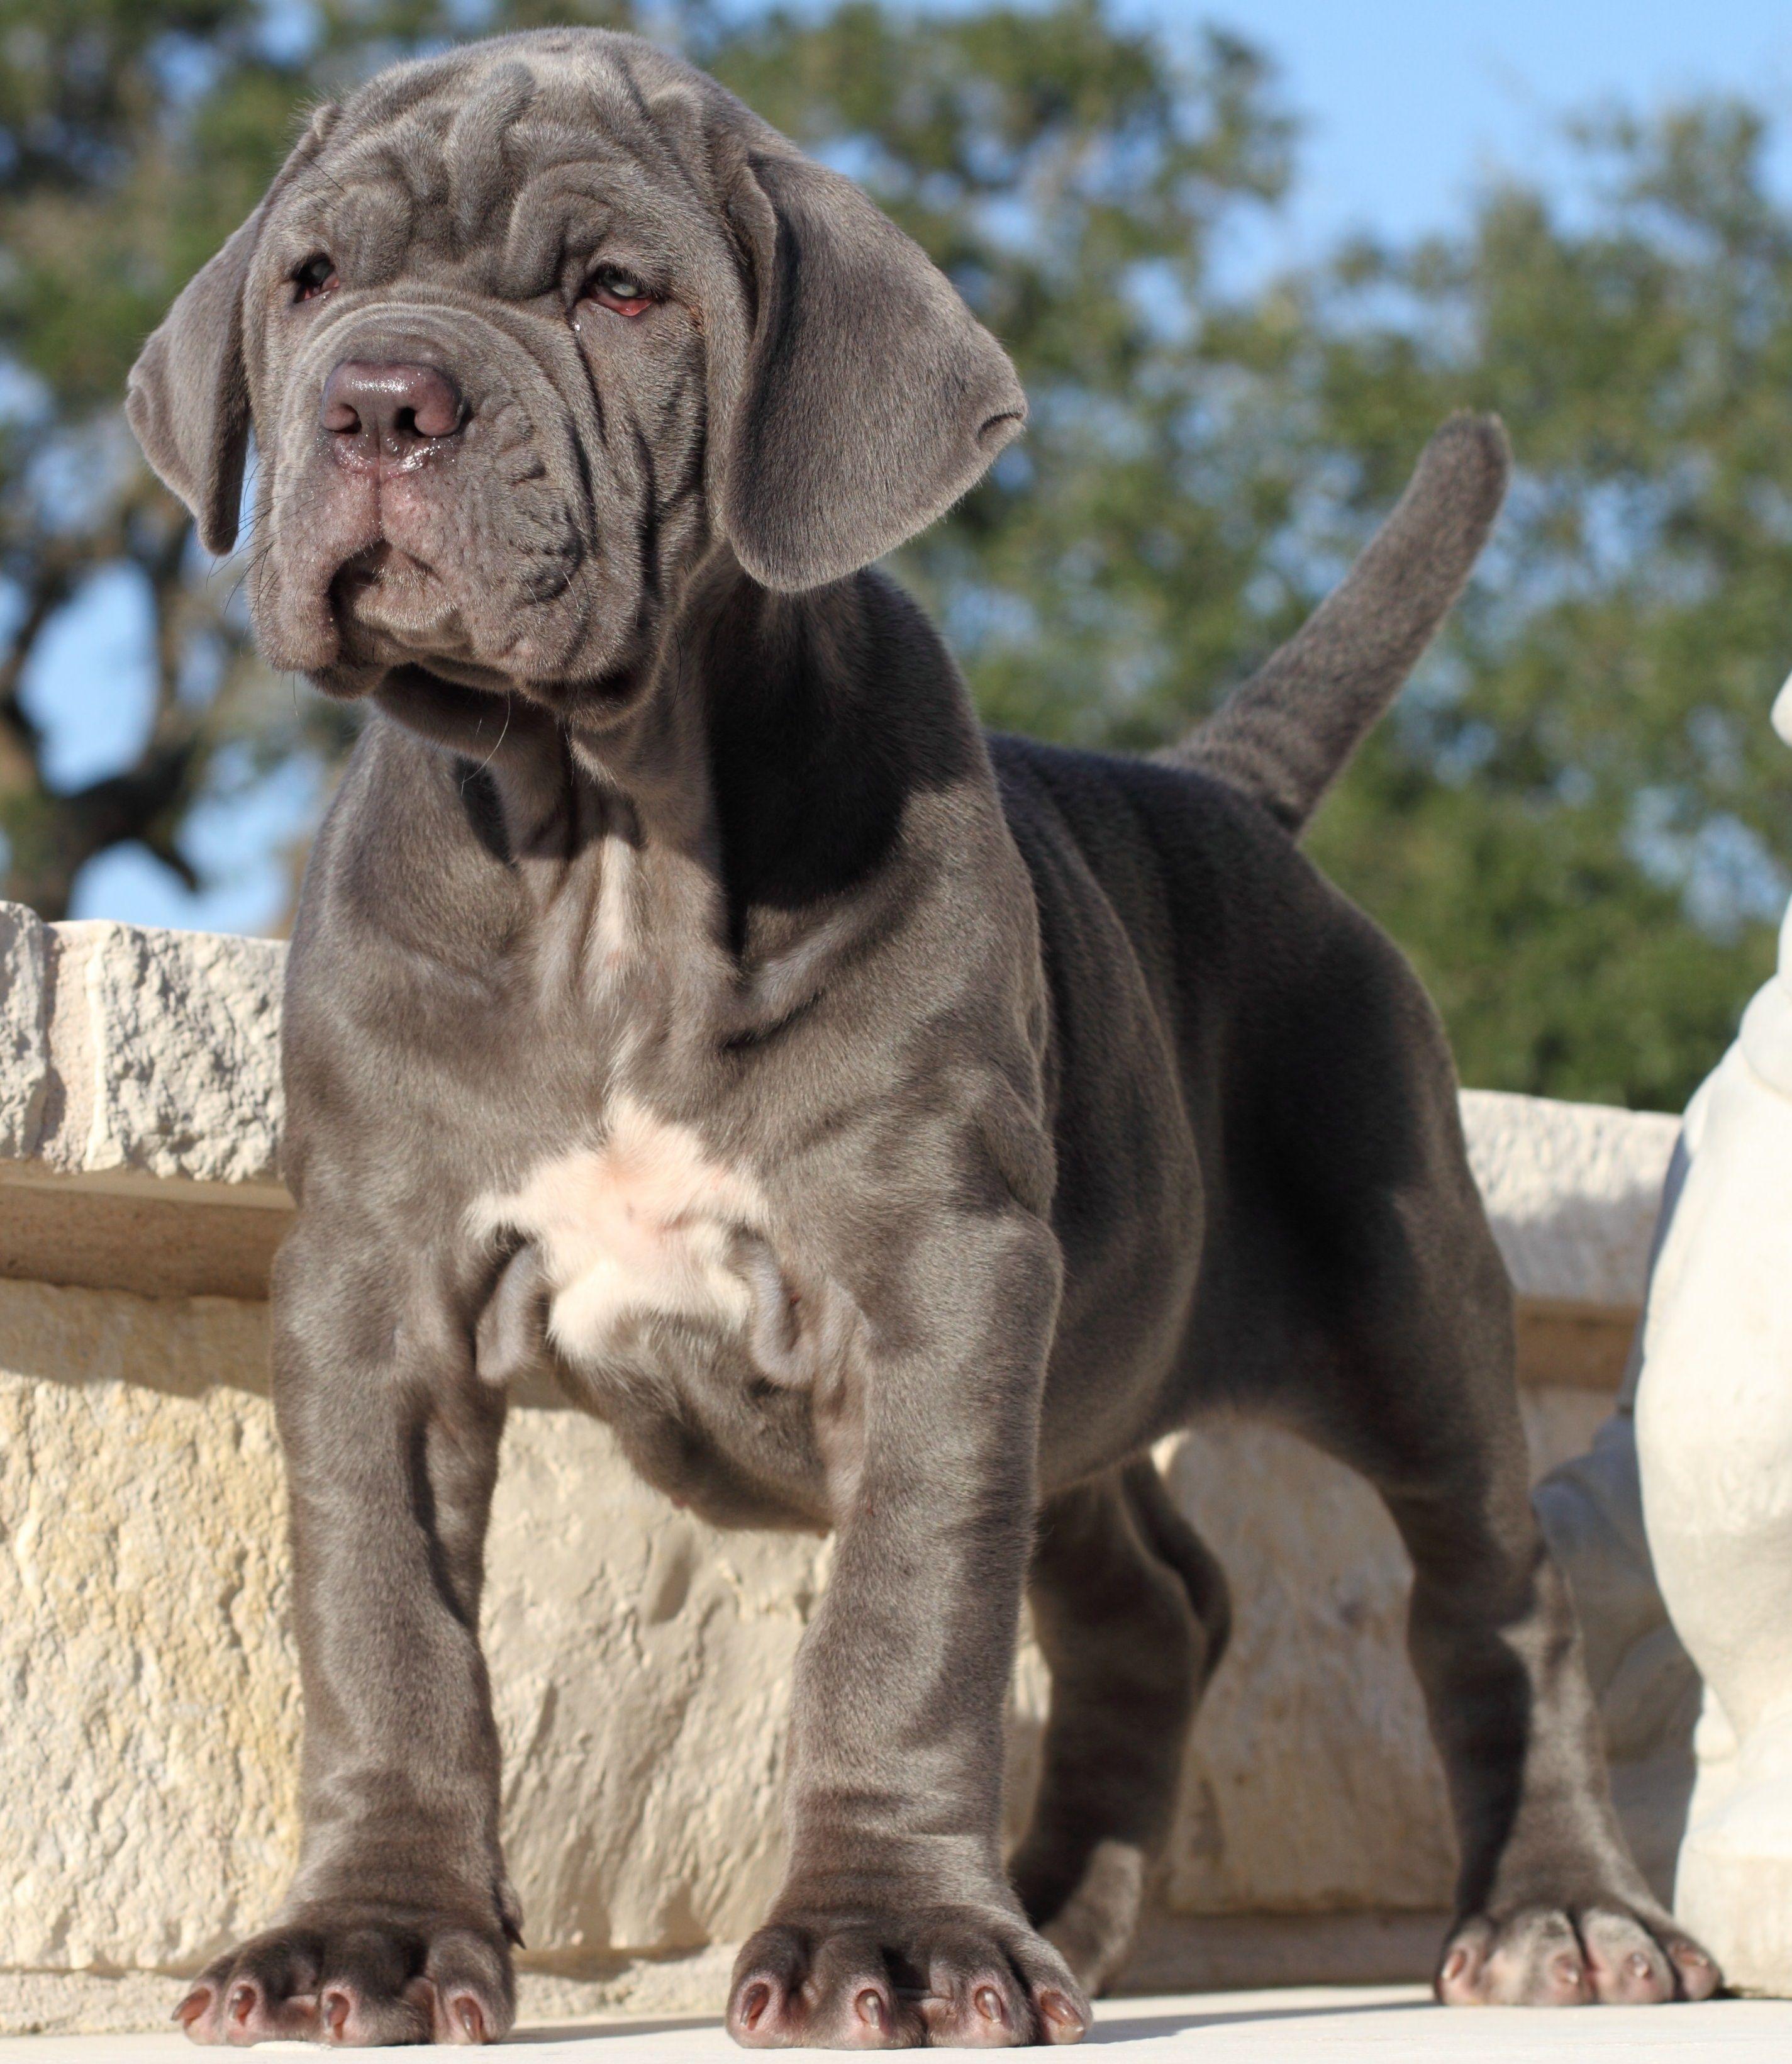 Neapolitan Mastiff Mastiff Puppies Mastiff Dogs English Mastiff Puppies